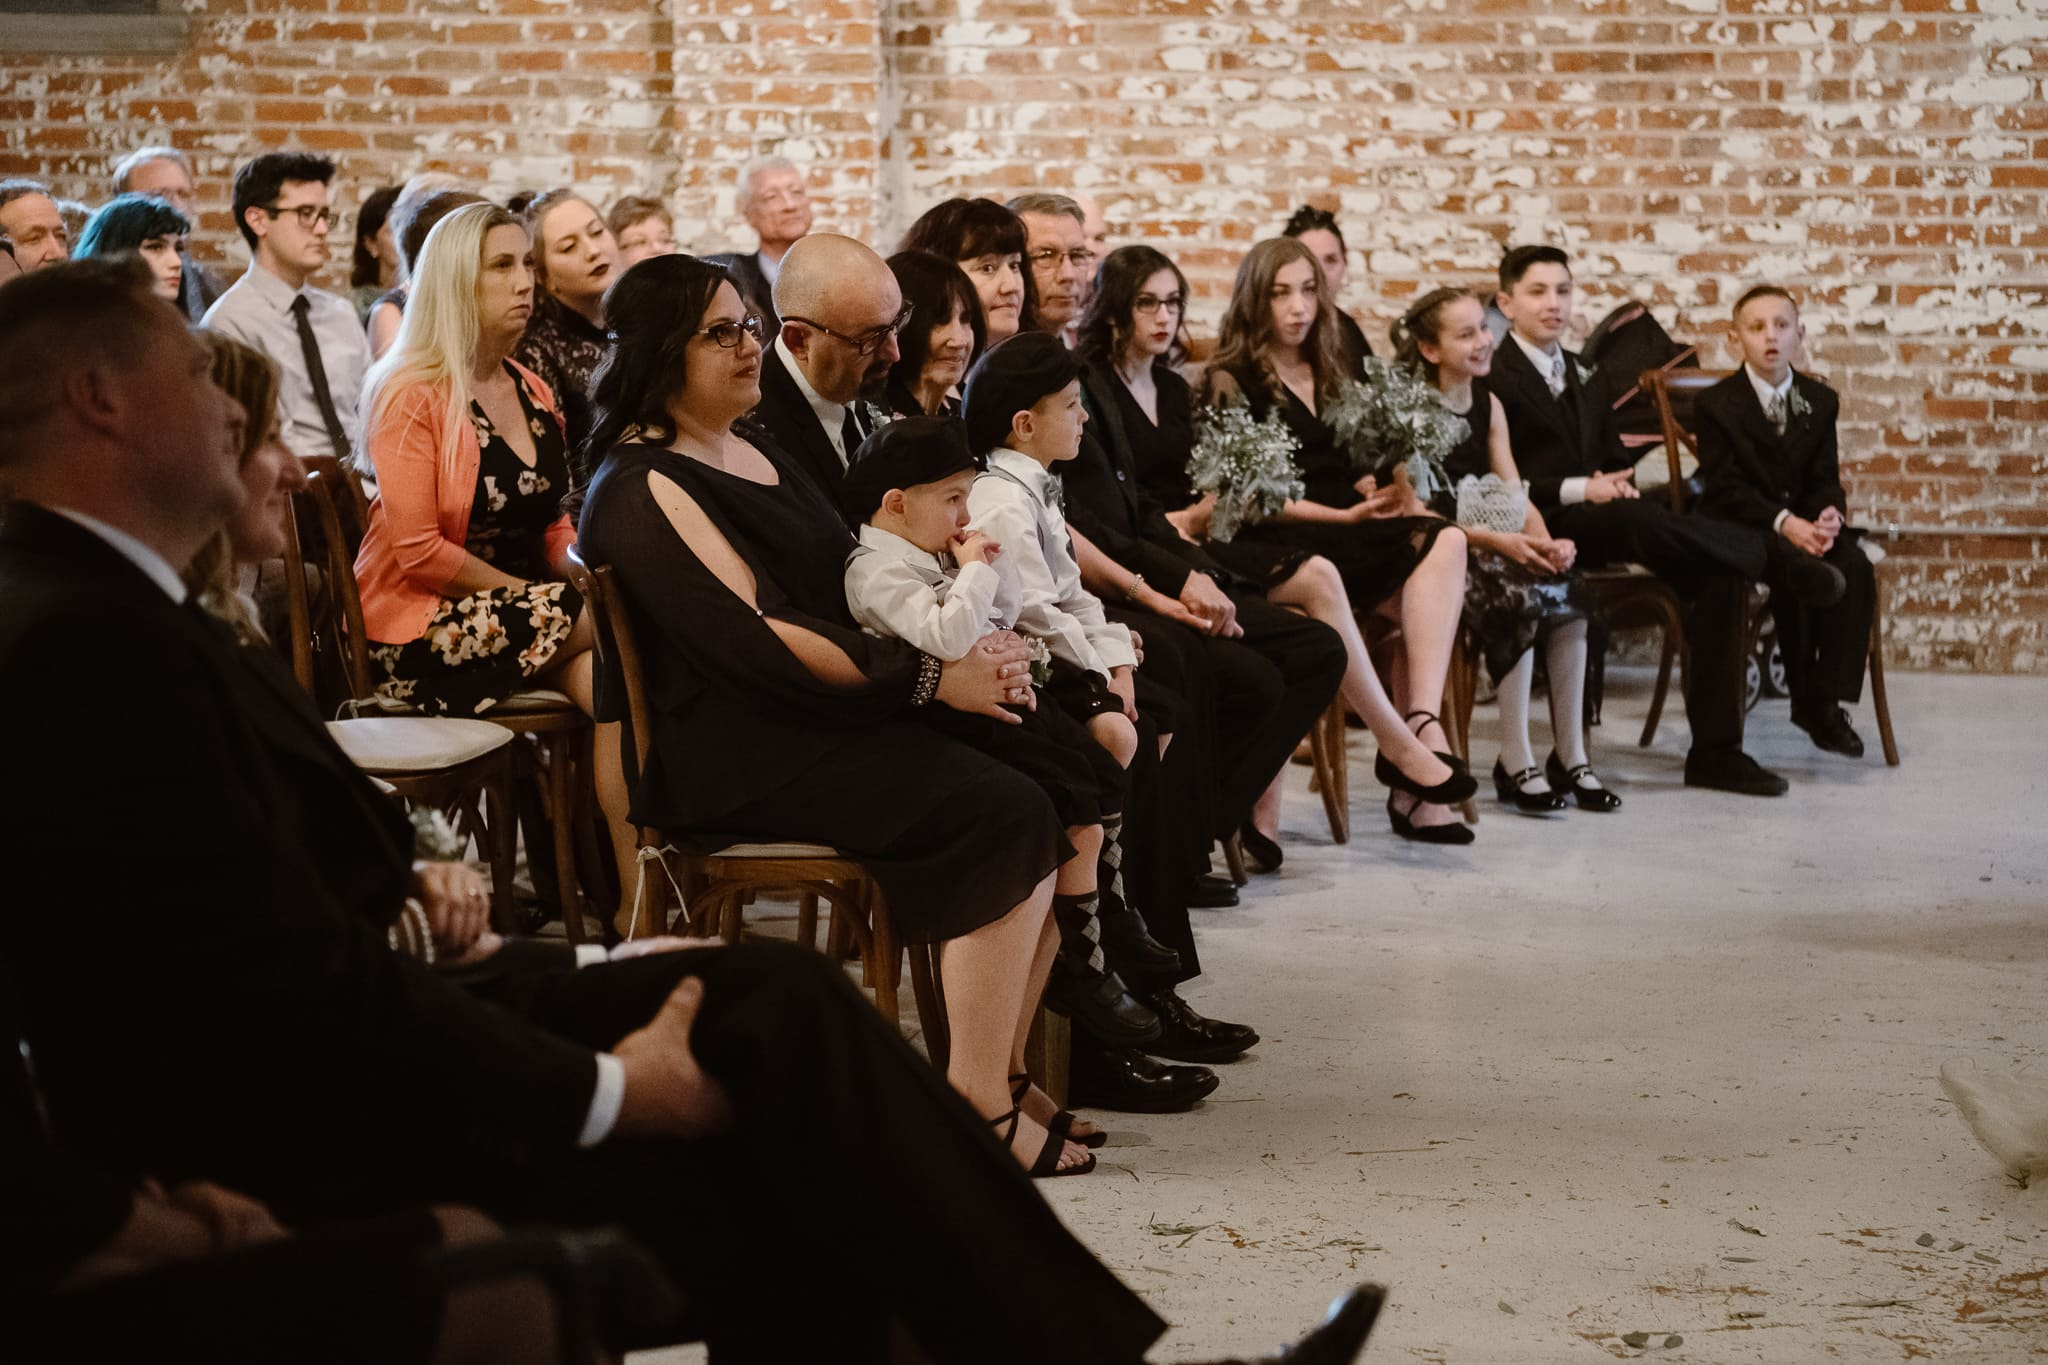 St Vrain Wedding Photographer   Longmont Wedding Photographer   Colorado Winter Wedding Photographer, Colorado industrial chic wedding ceremony, family watching ceremony